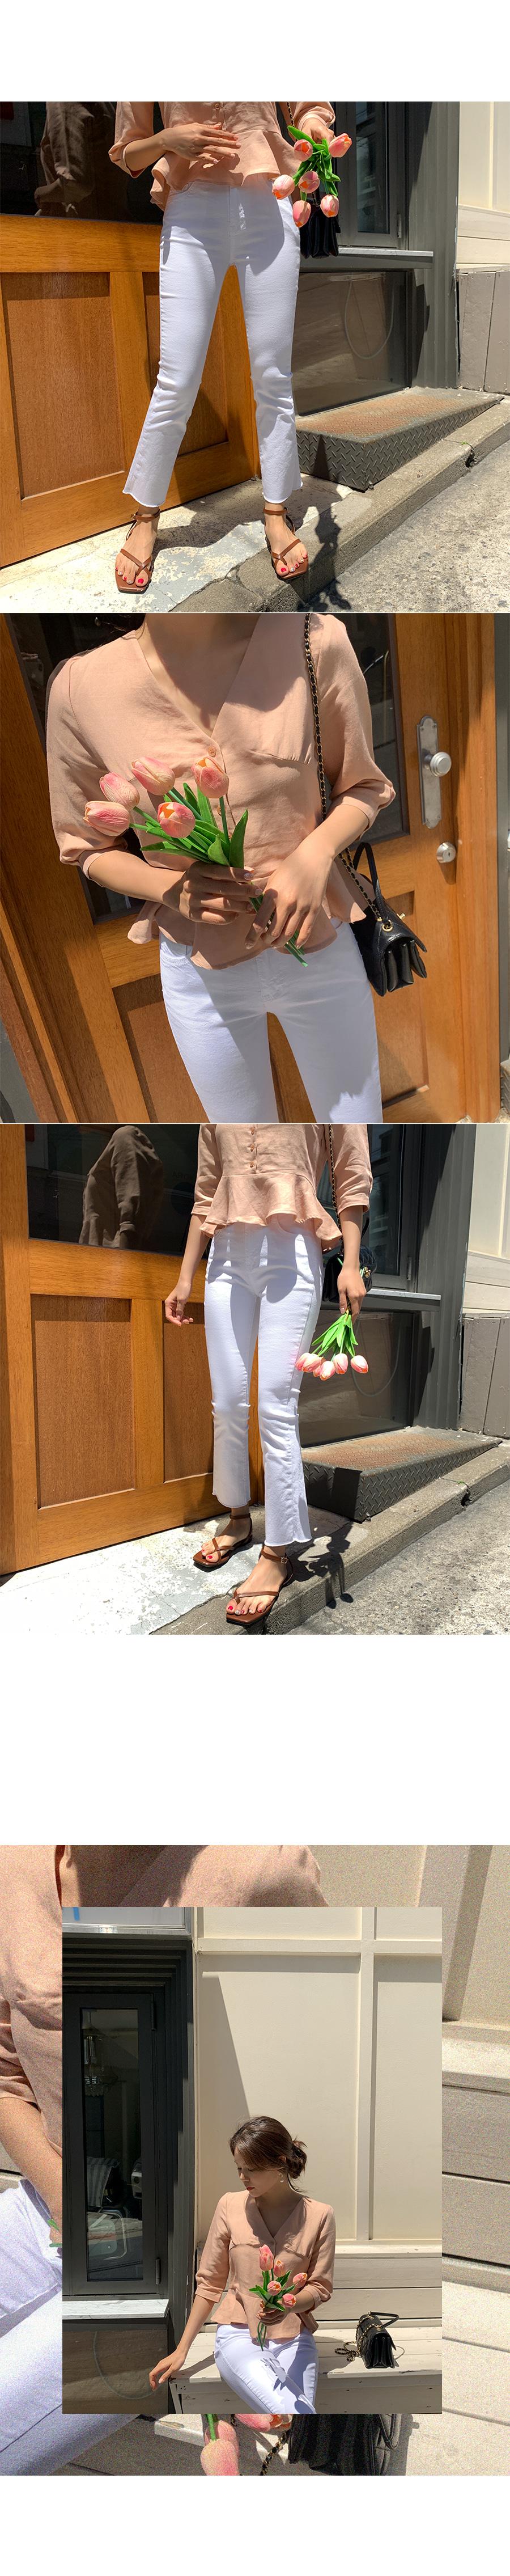 Ridget Date Banding Cotton Pants